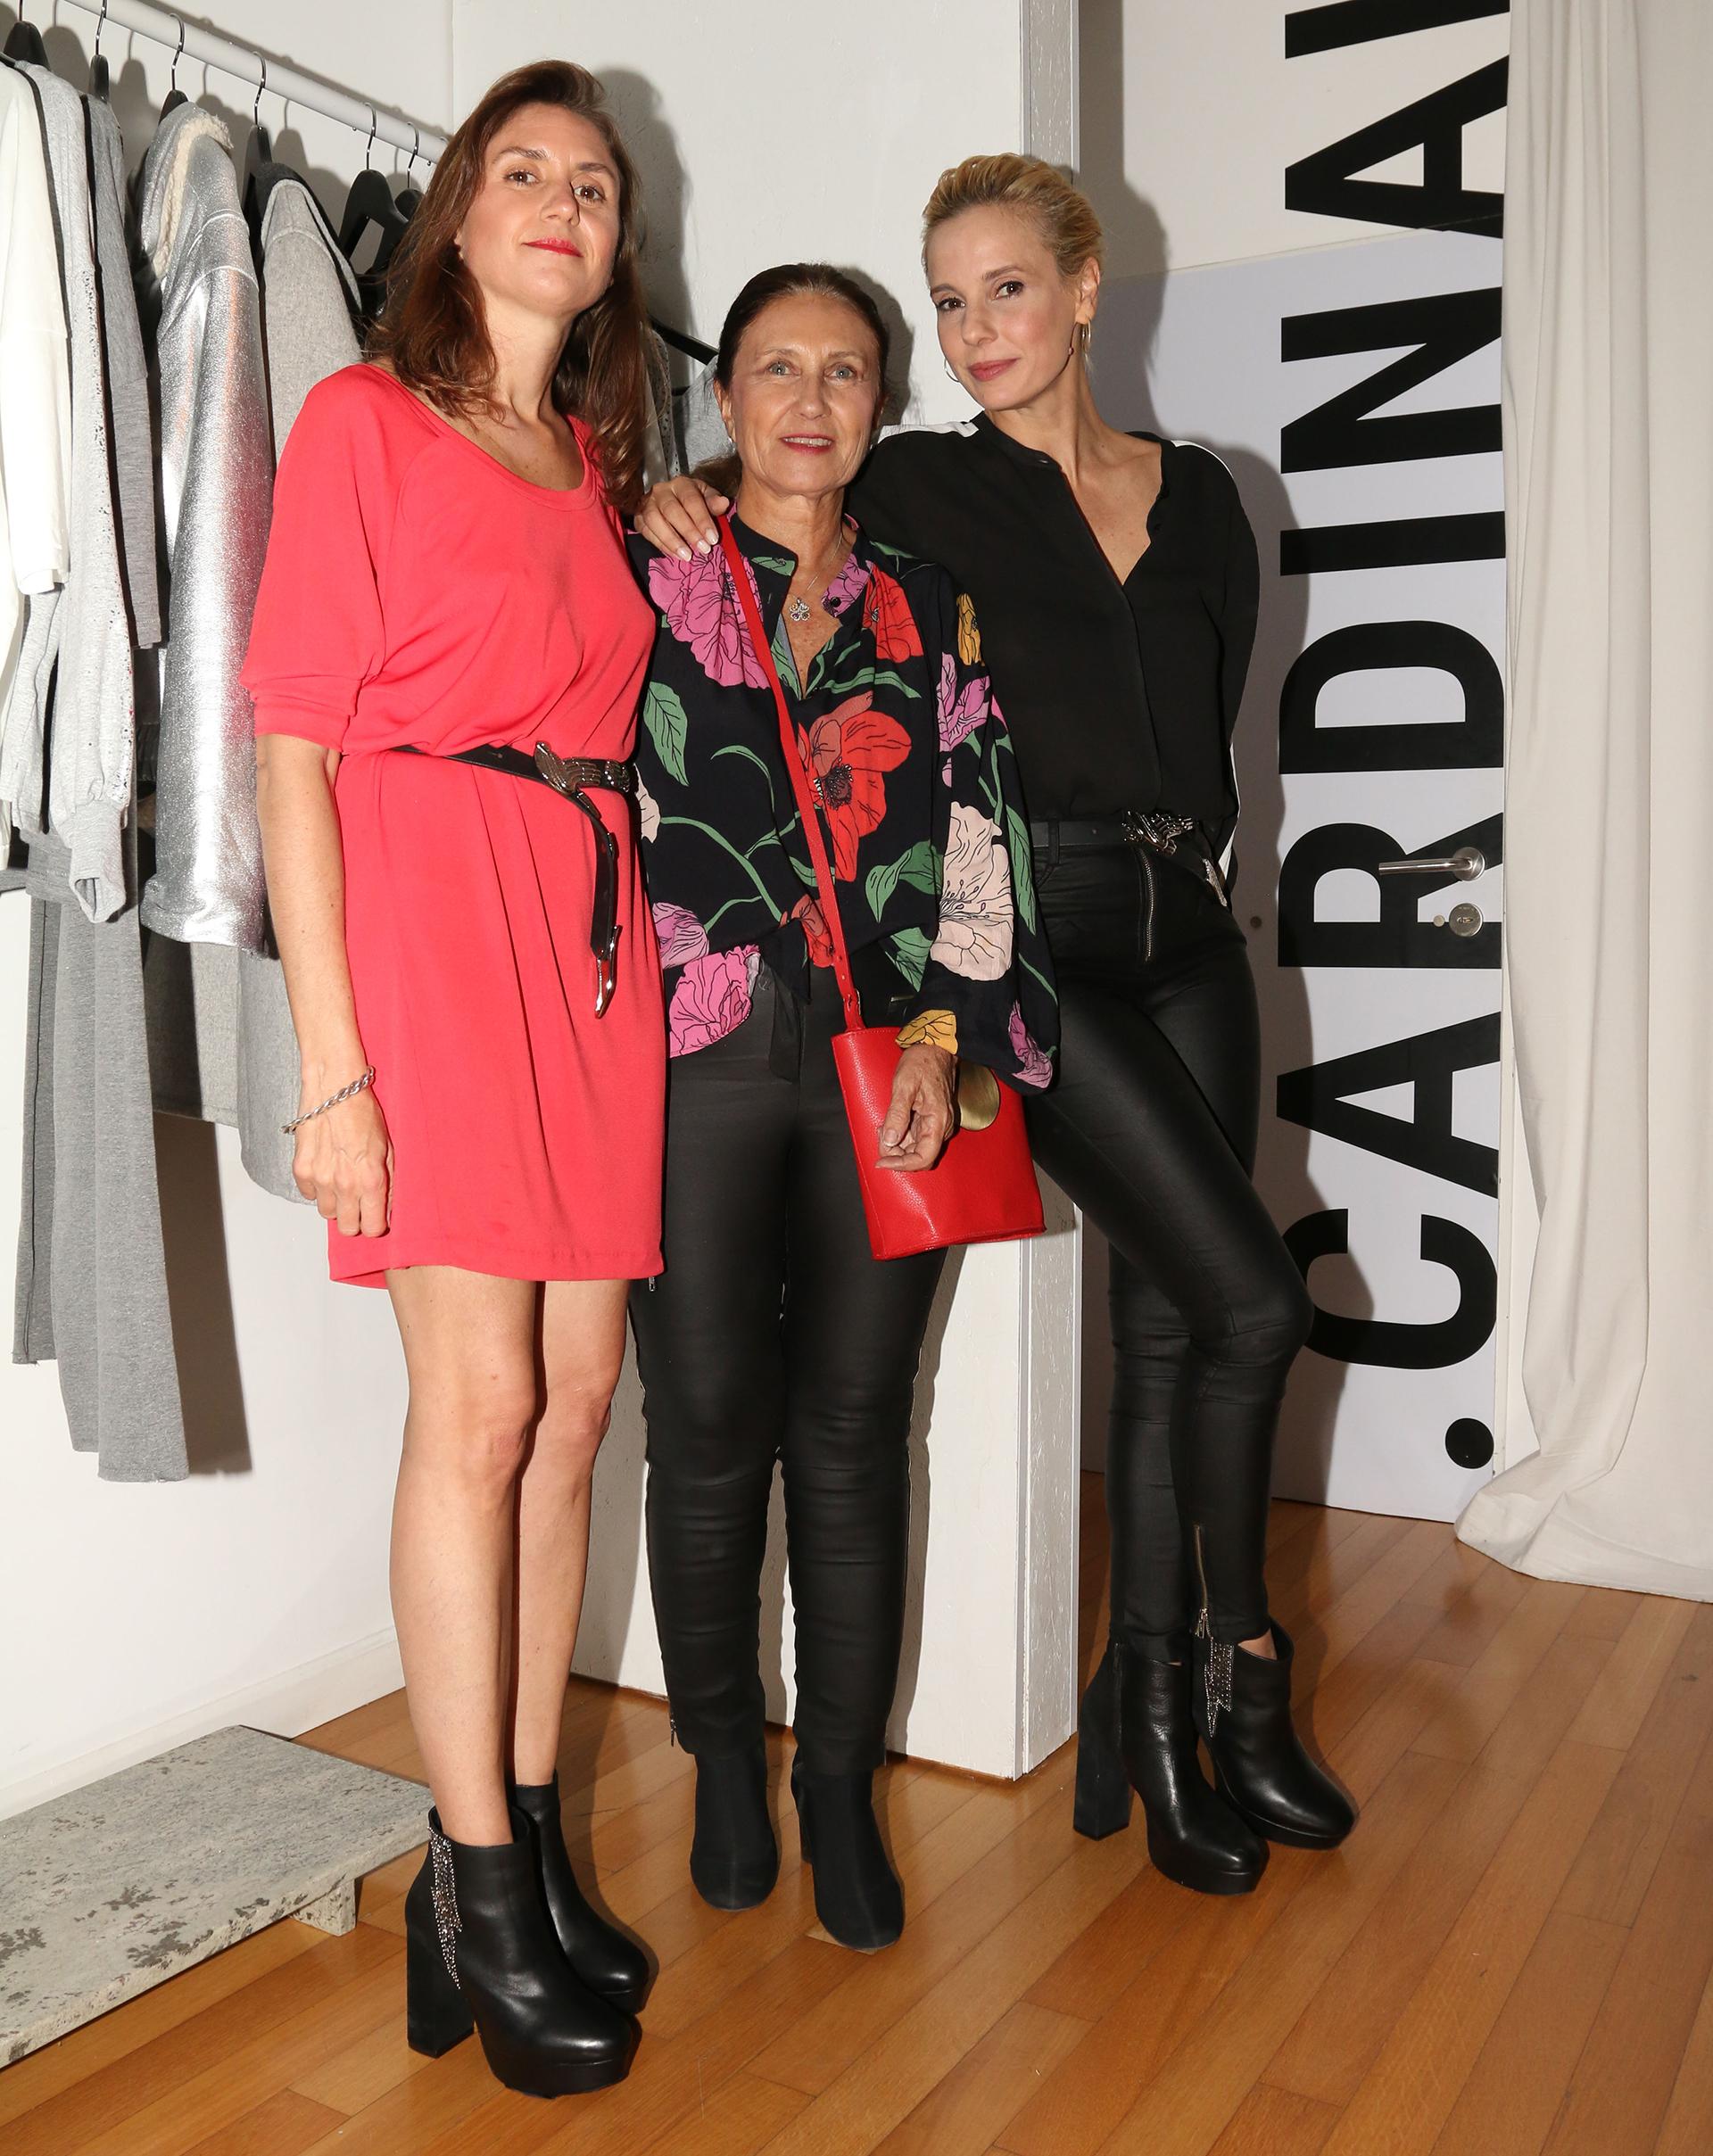 Abril Bellati, Clara Ibarguren y Julieta Cardinali